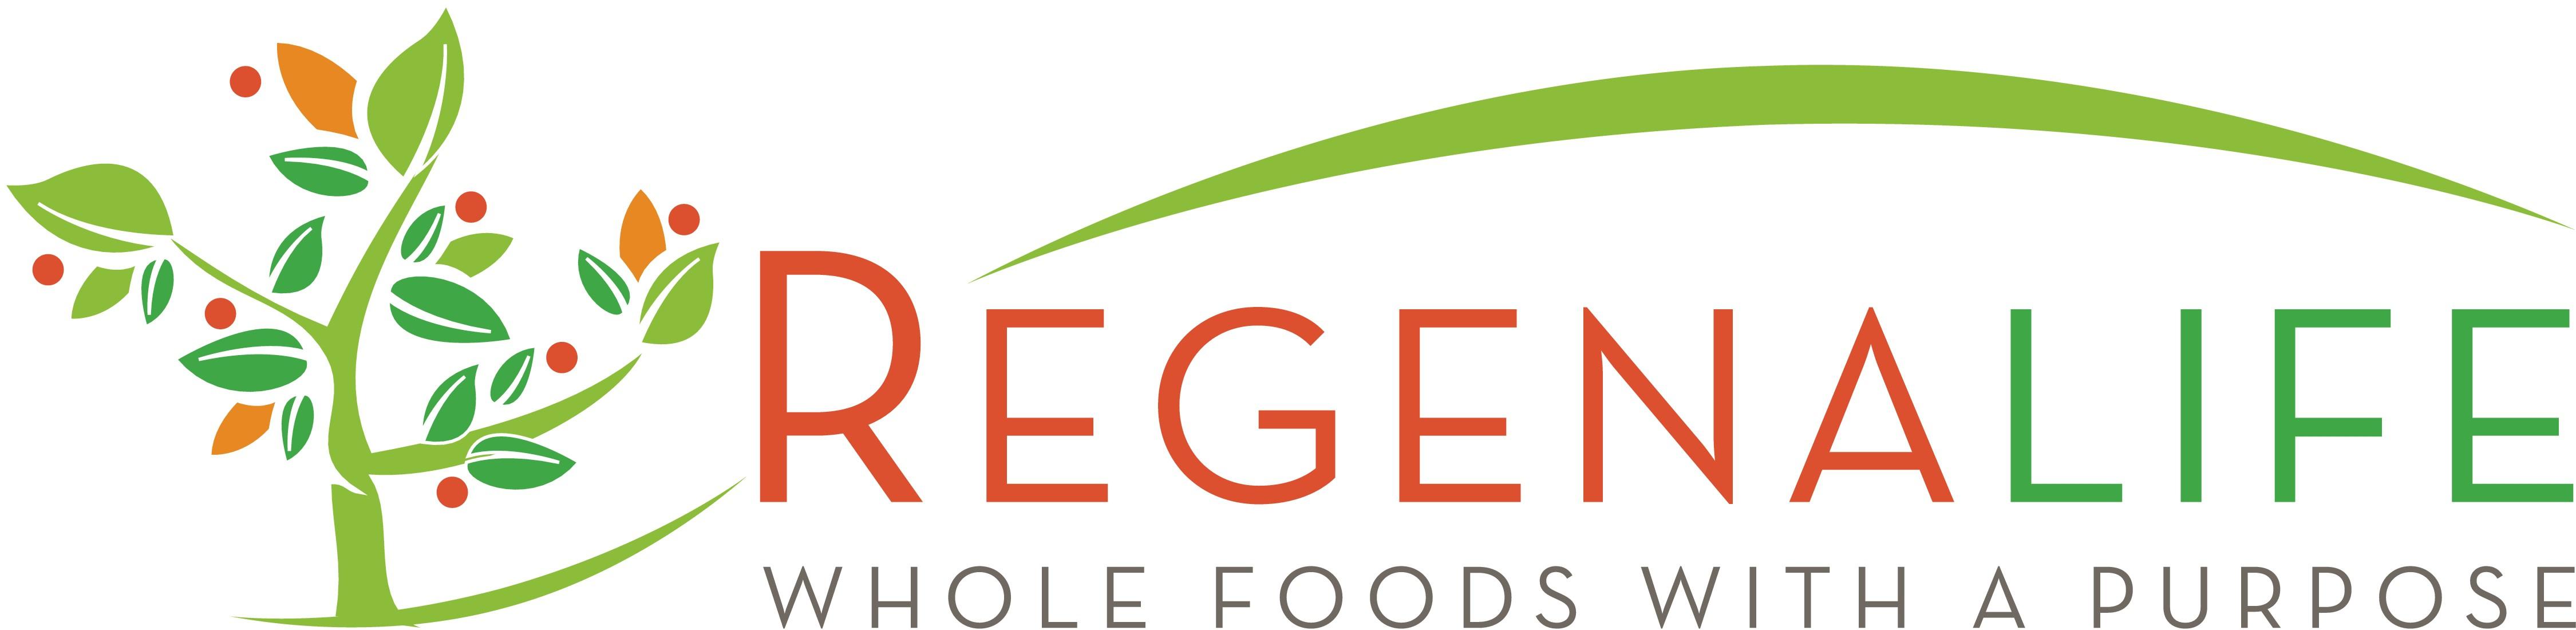 Create a new logo for  health and wellness company